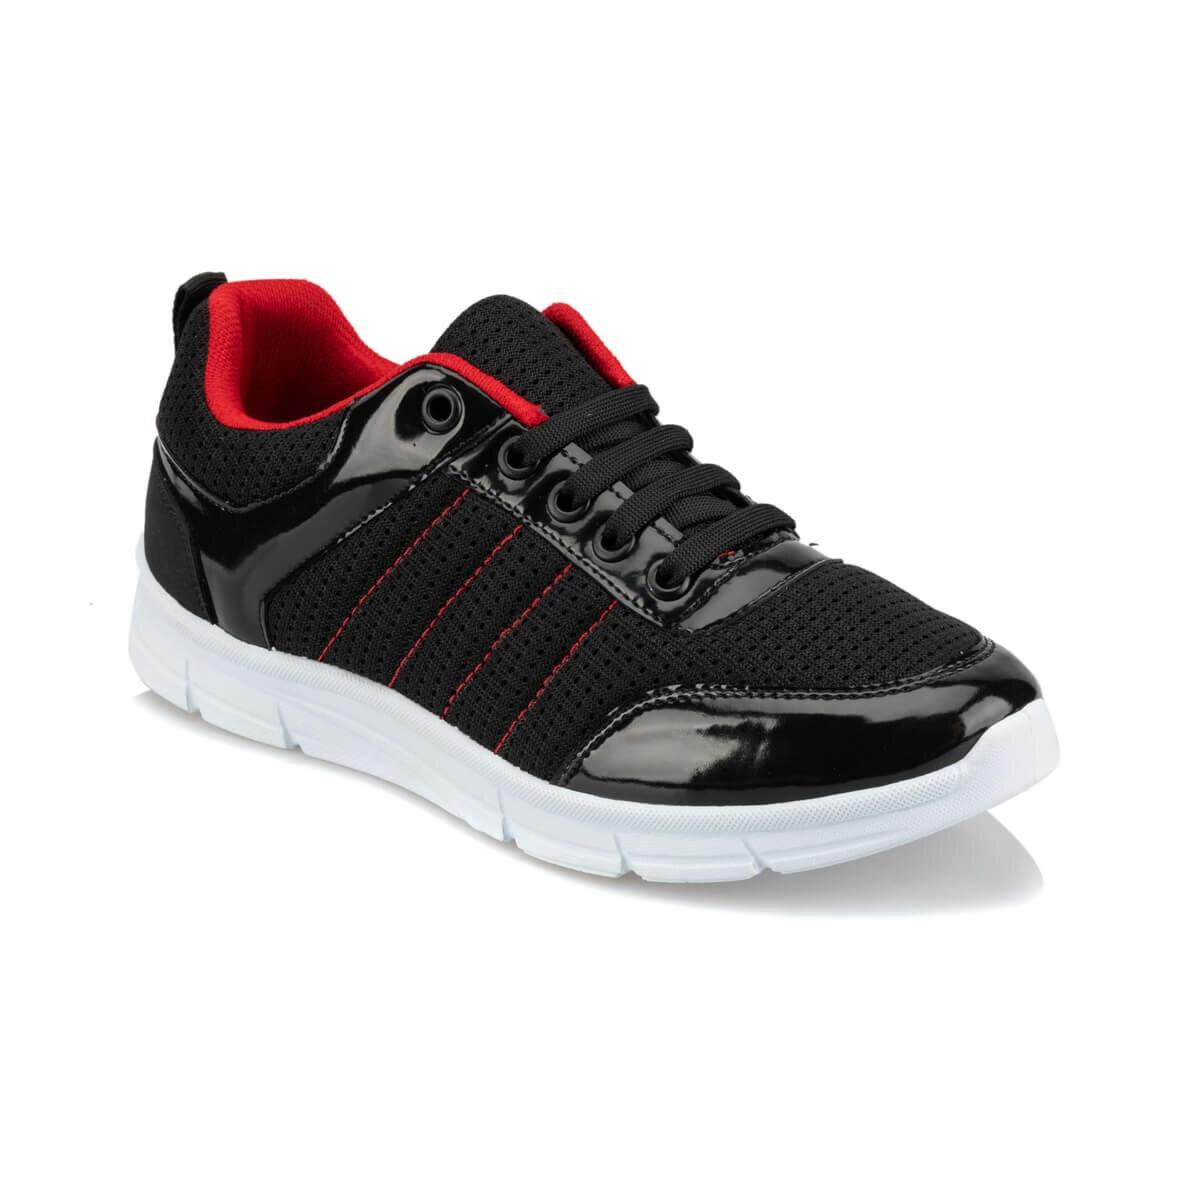 FLO 92.314825.Z Black Women Sneaker Polaris